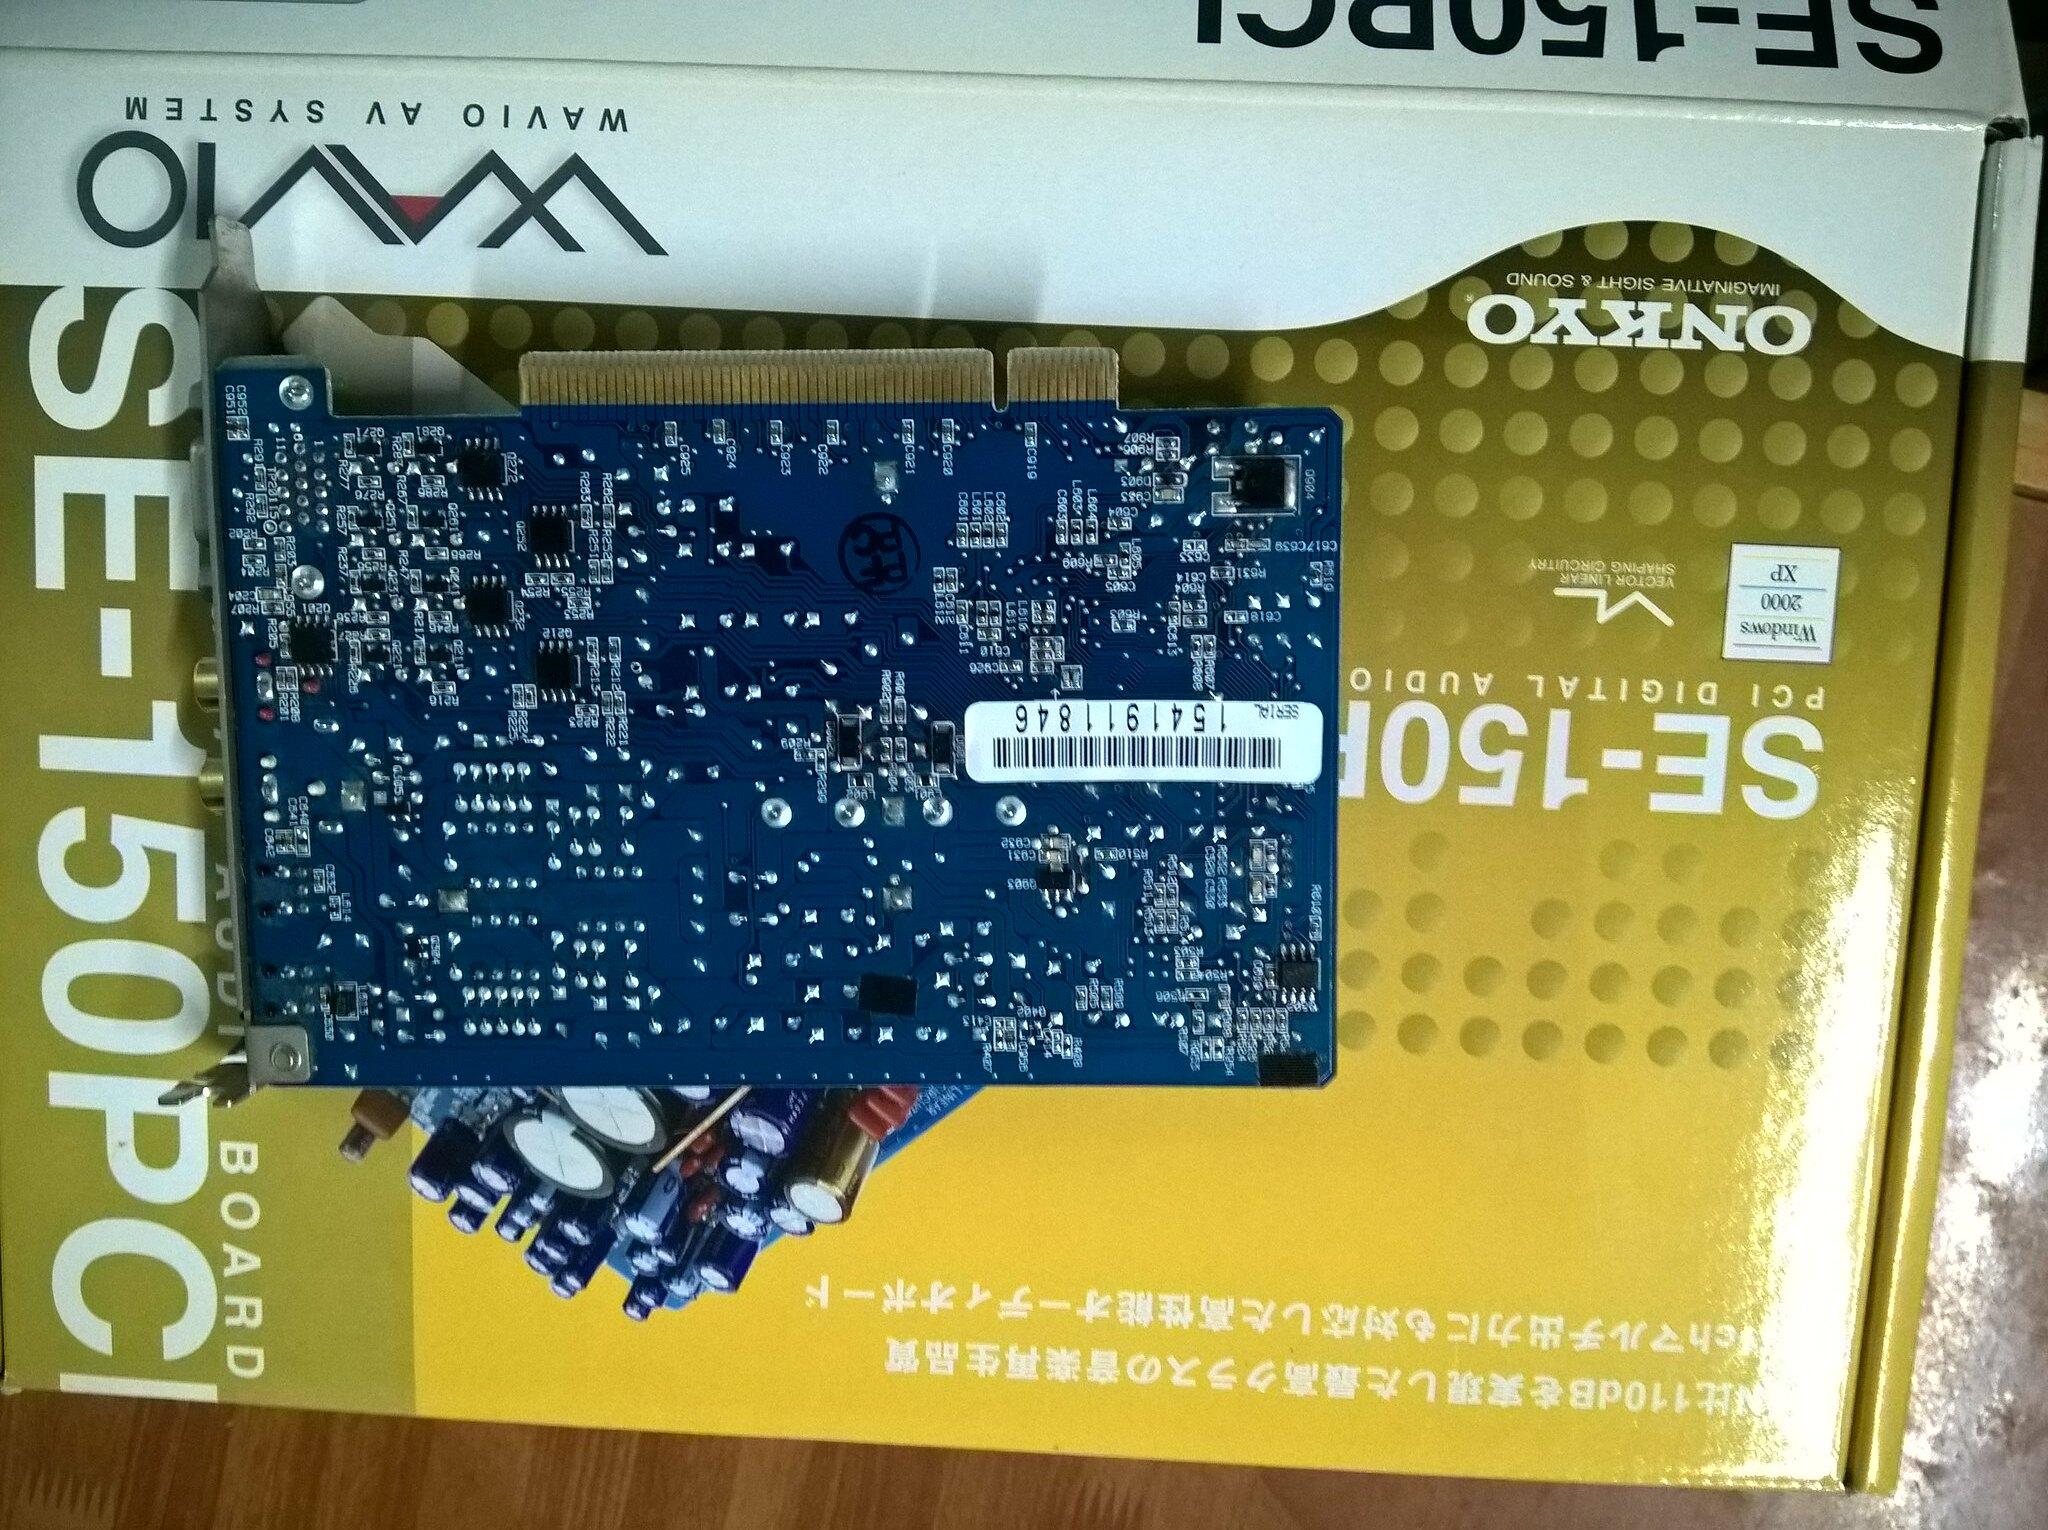 Onkyo từ Japan - U55SX, U55SX2, 200PCI LTD, 200PCI, 150PCI, 90PCI - 11